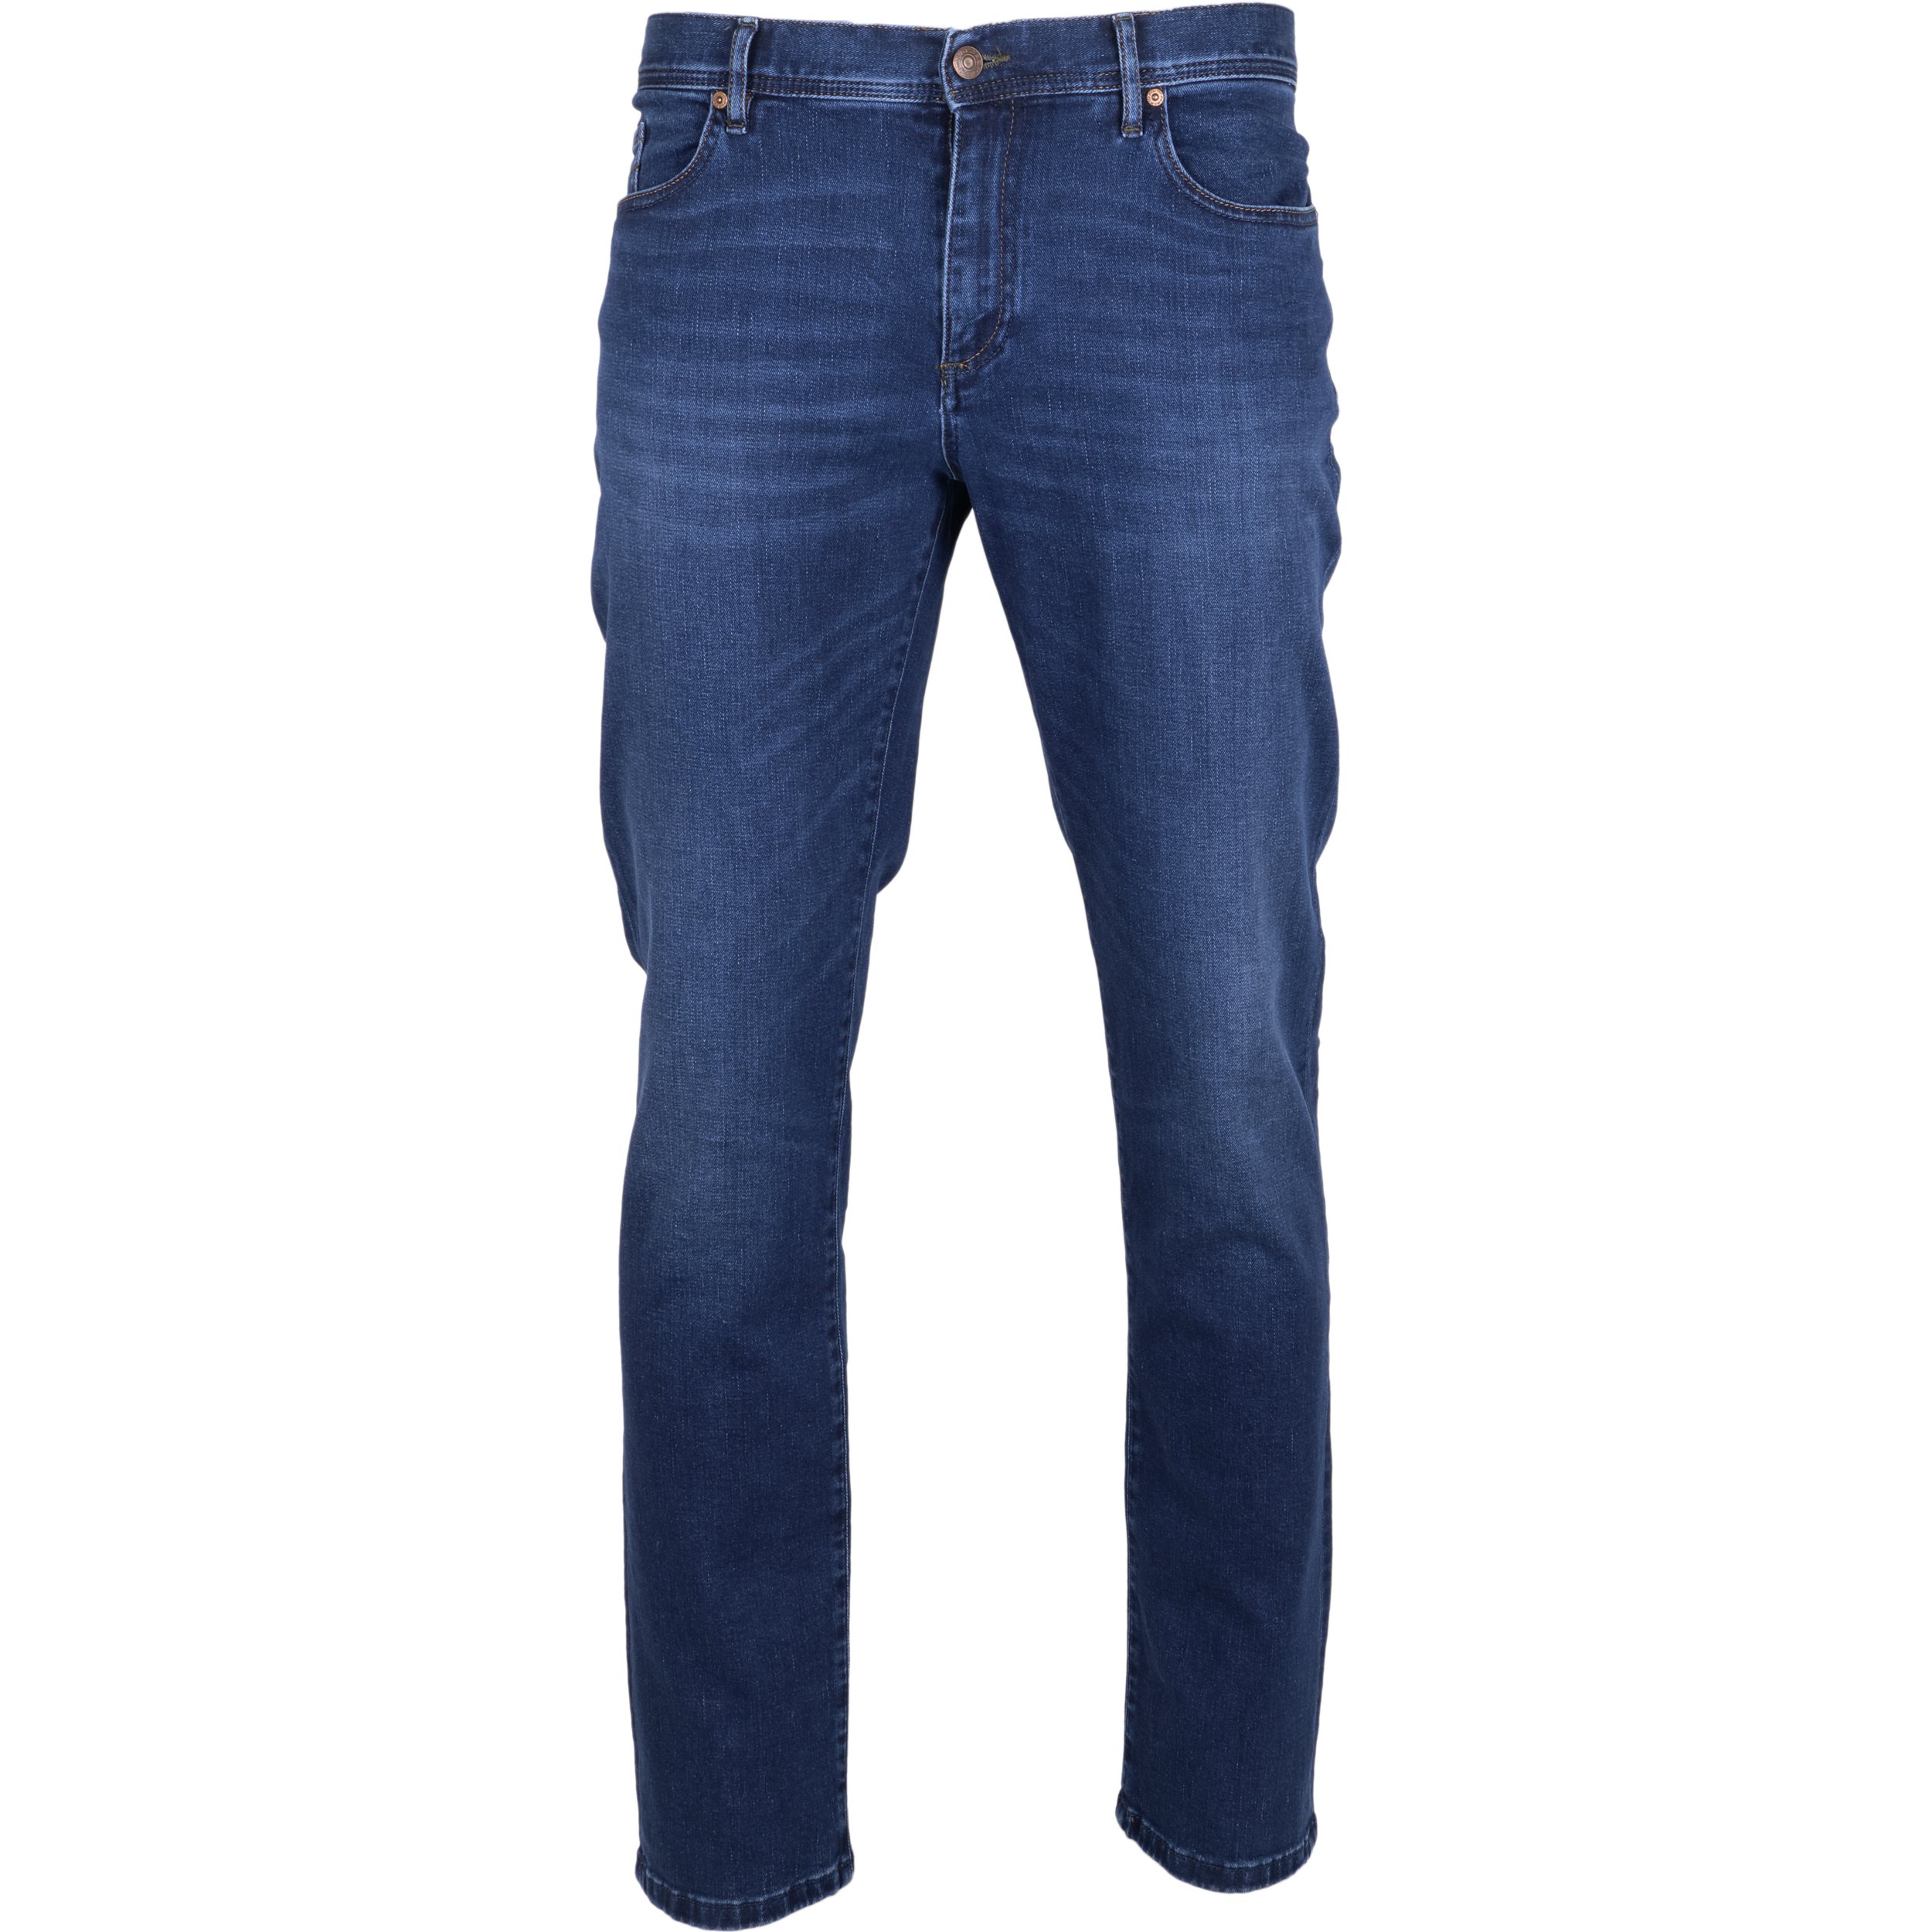 Alberto Herren Jeans Pipe regular fit - dark blue 32/34